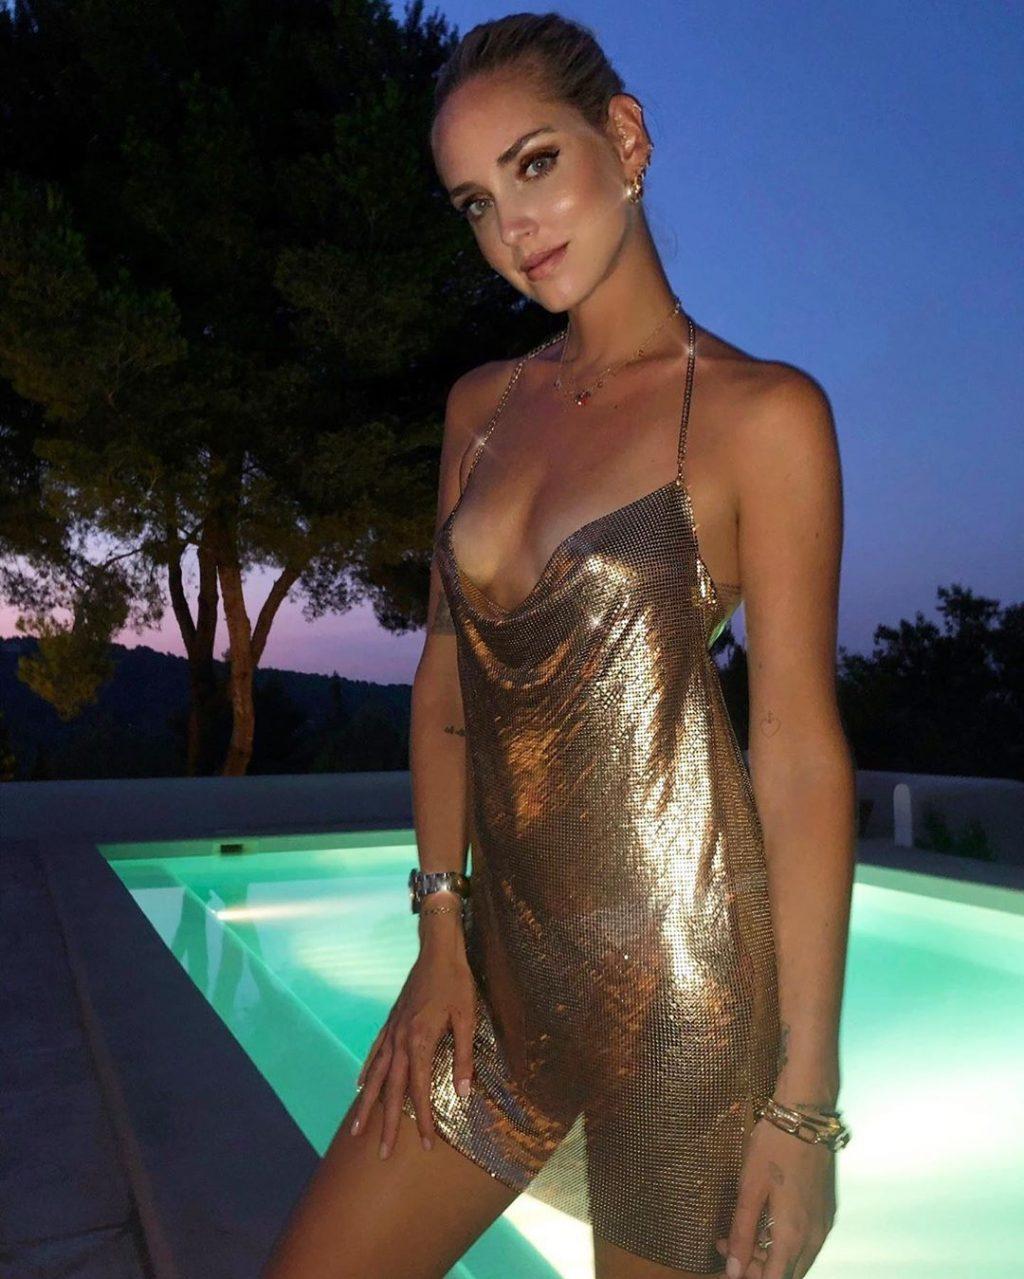 Chiara Ferragni Sexy (39 Photos)